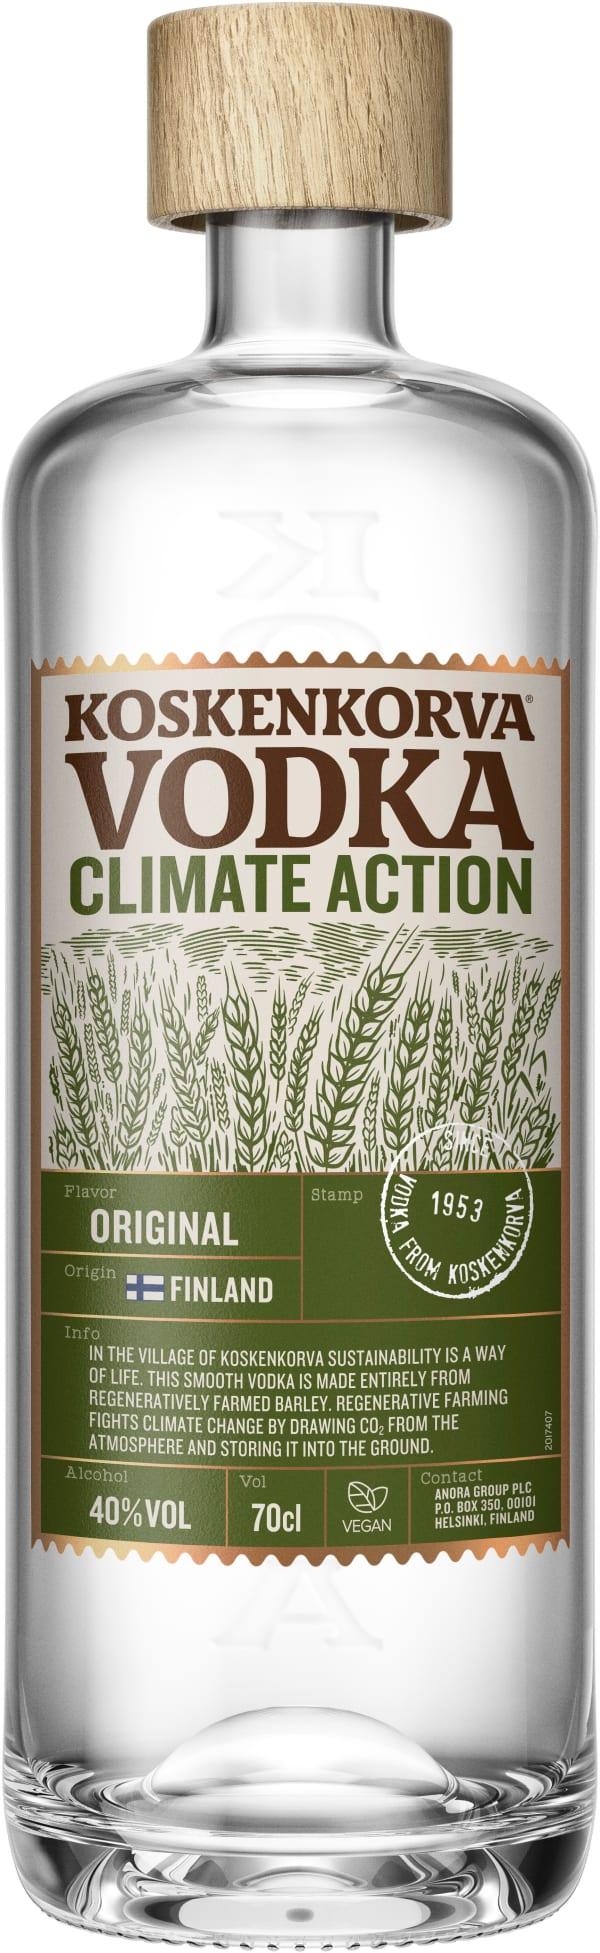 Koskenkorva Vodka Climate Action